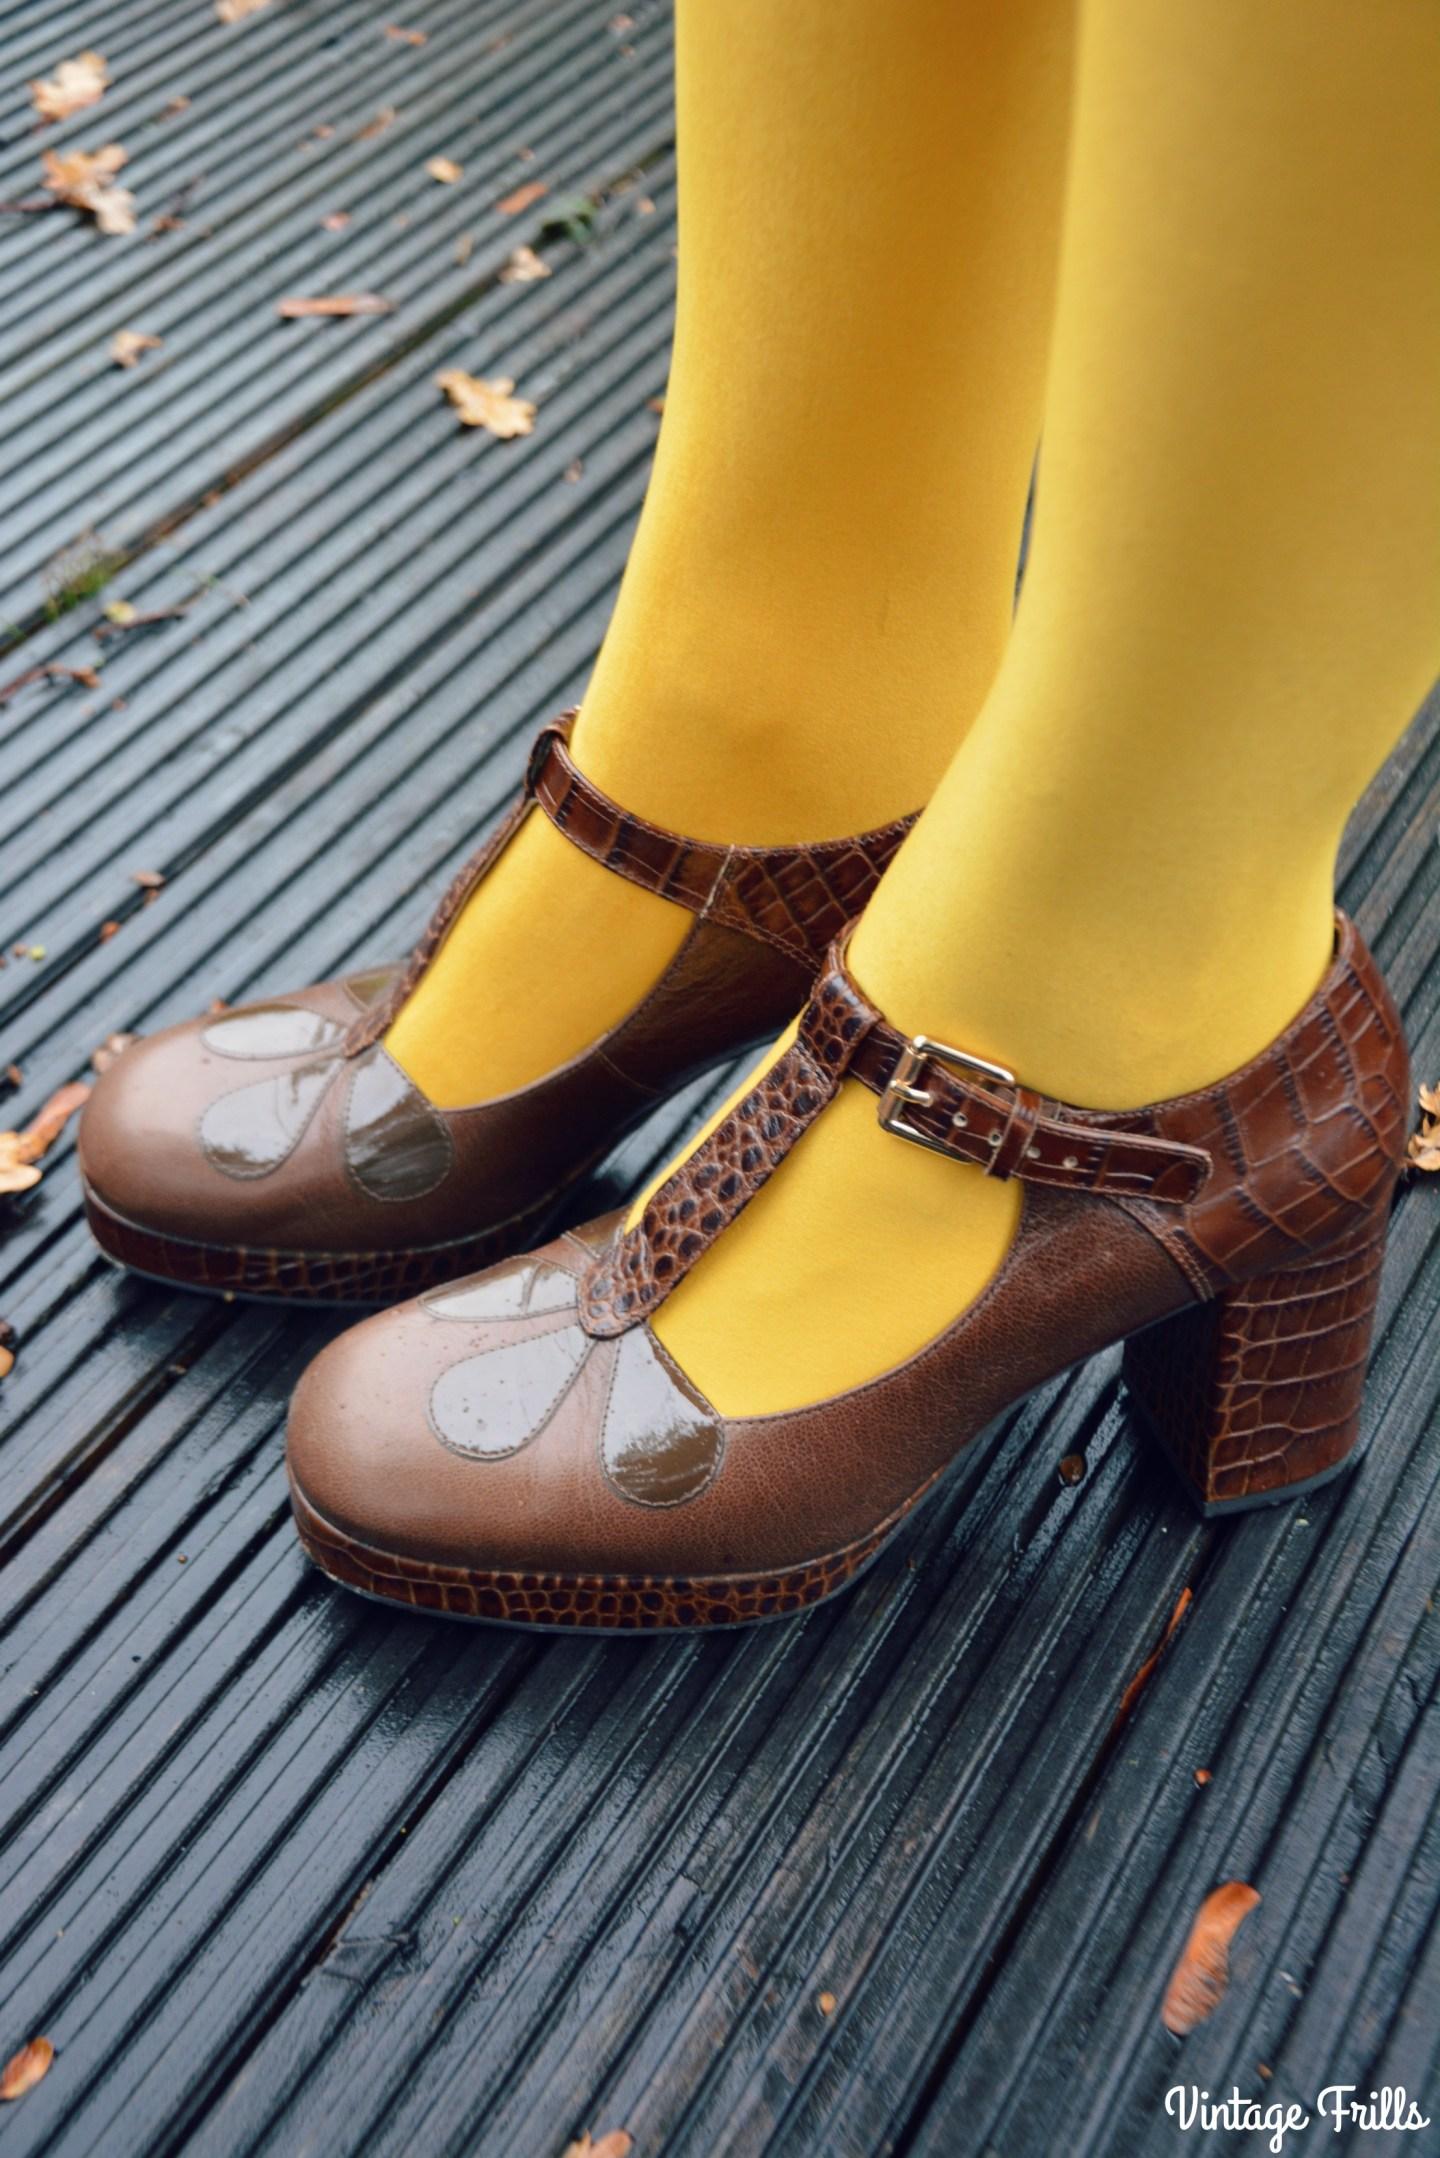 clarks-orla-kiely-abigail-shoes